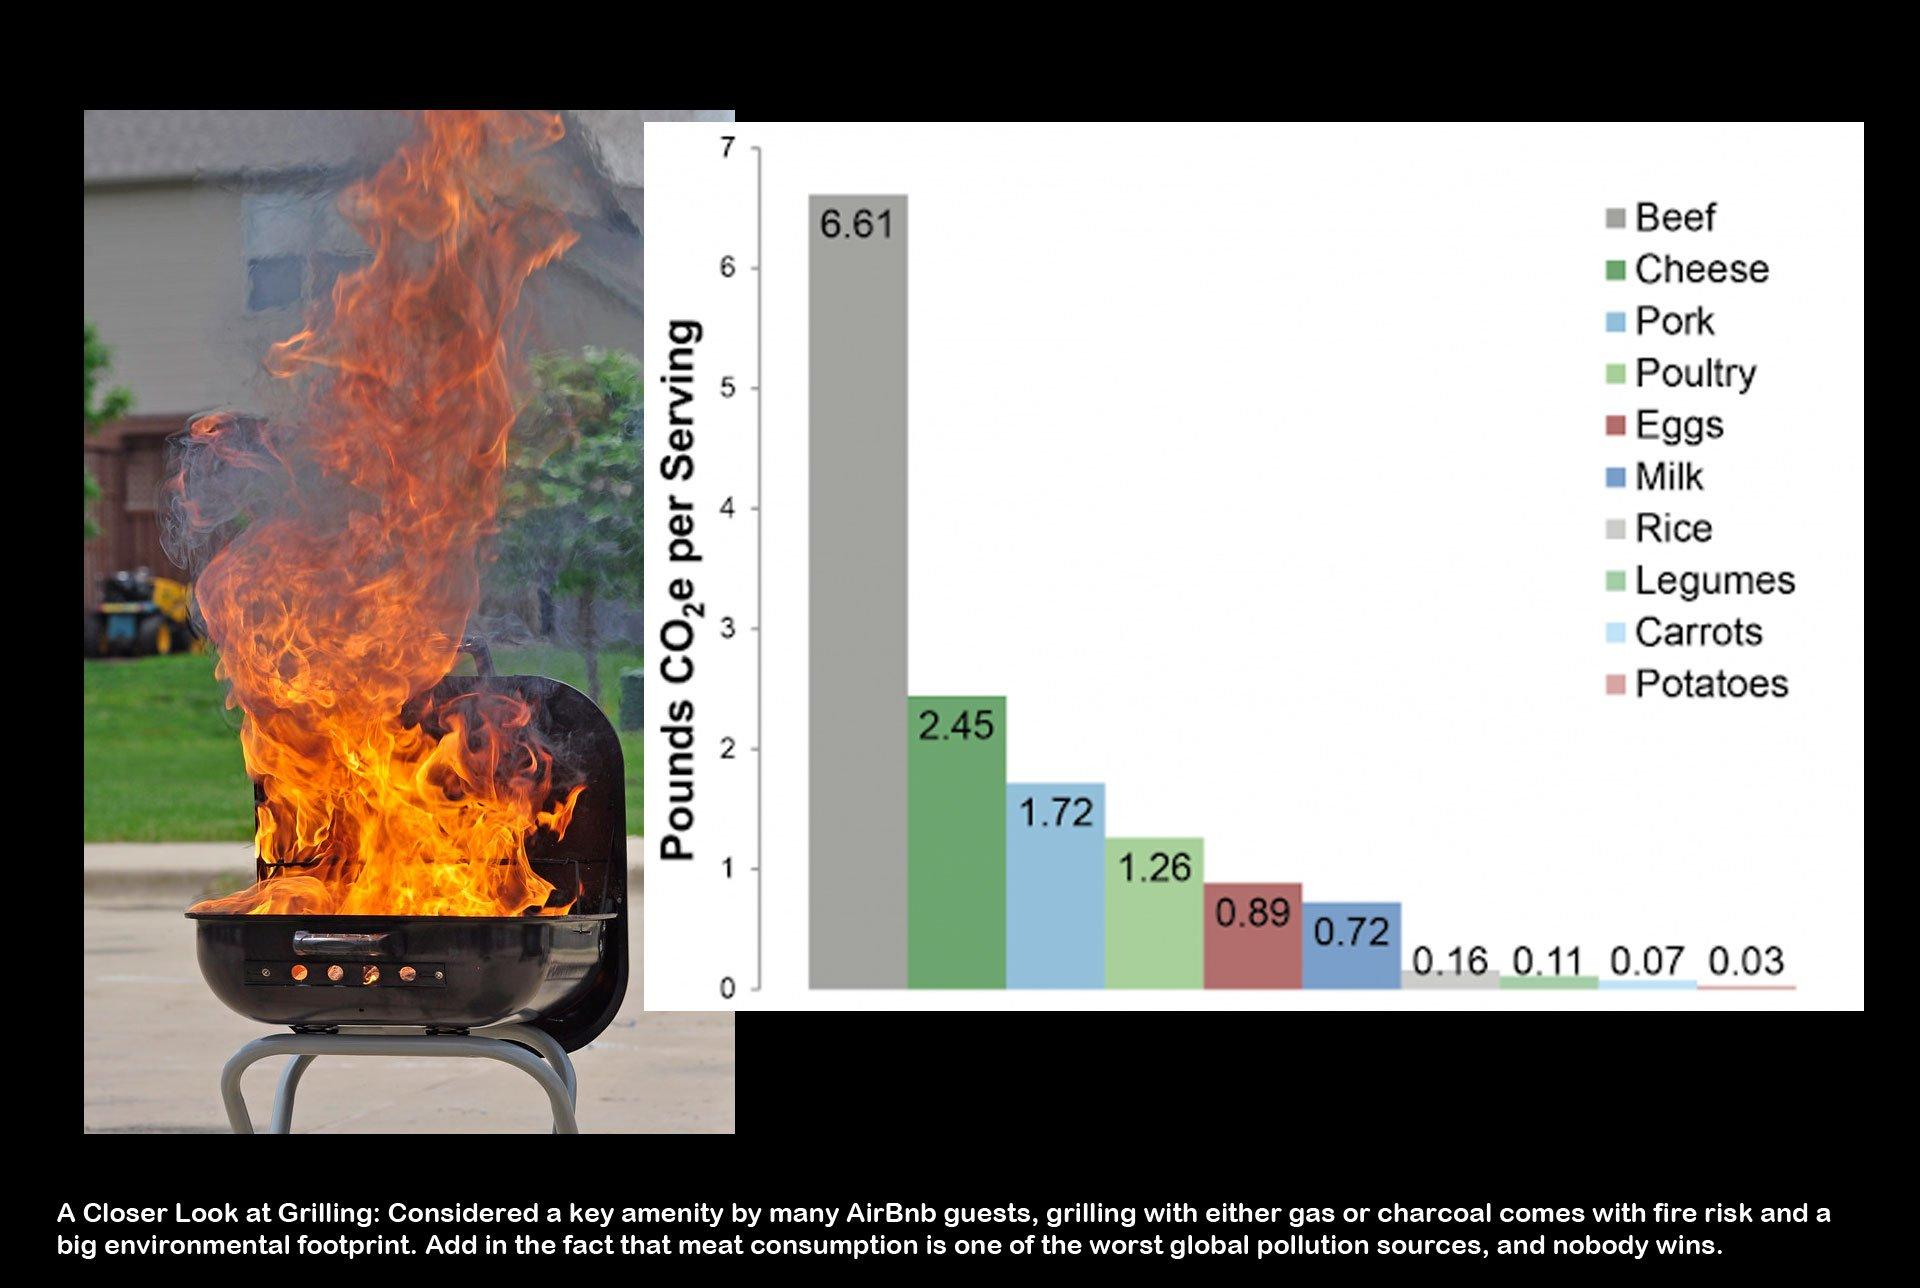 08-Grilling-ecological-burden-airbnb